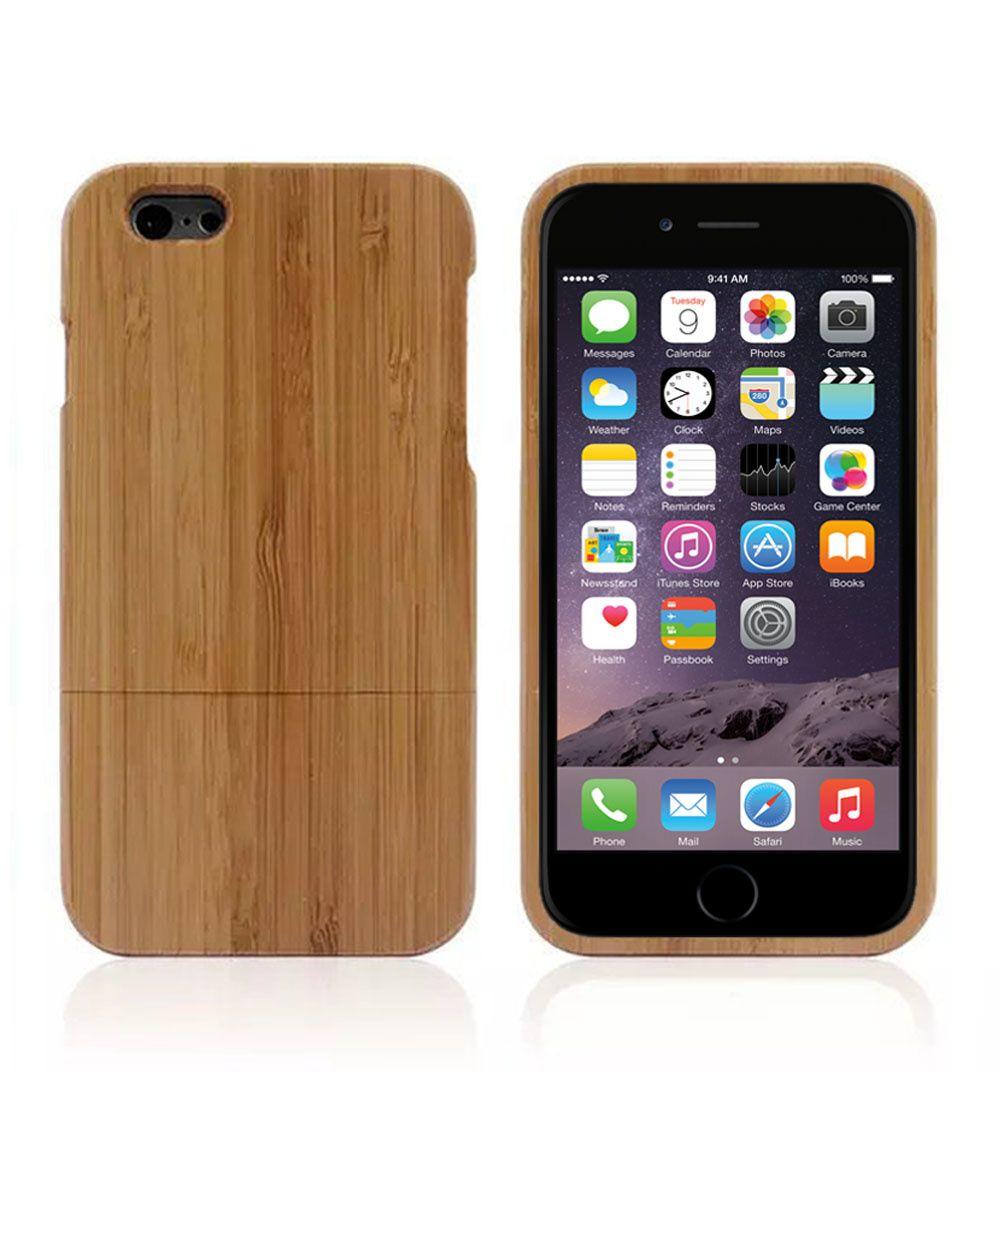 Bamboo iphone 6 plus case iphone iphone 6 plus case